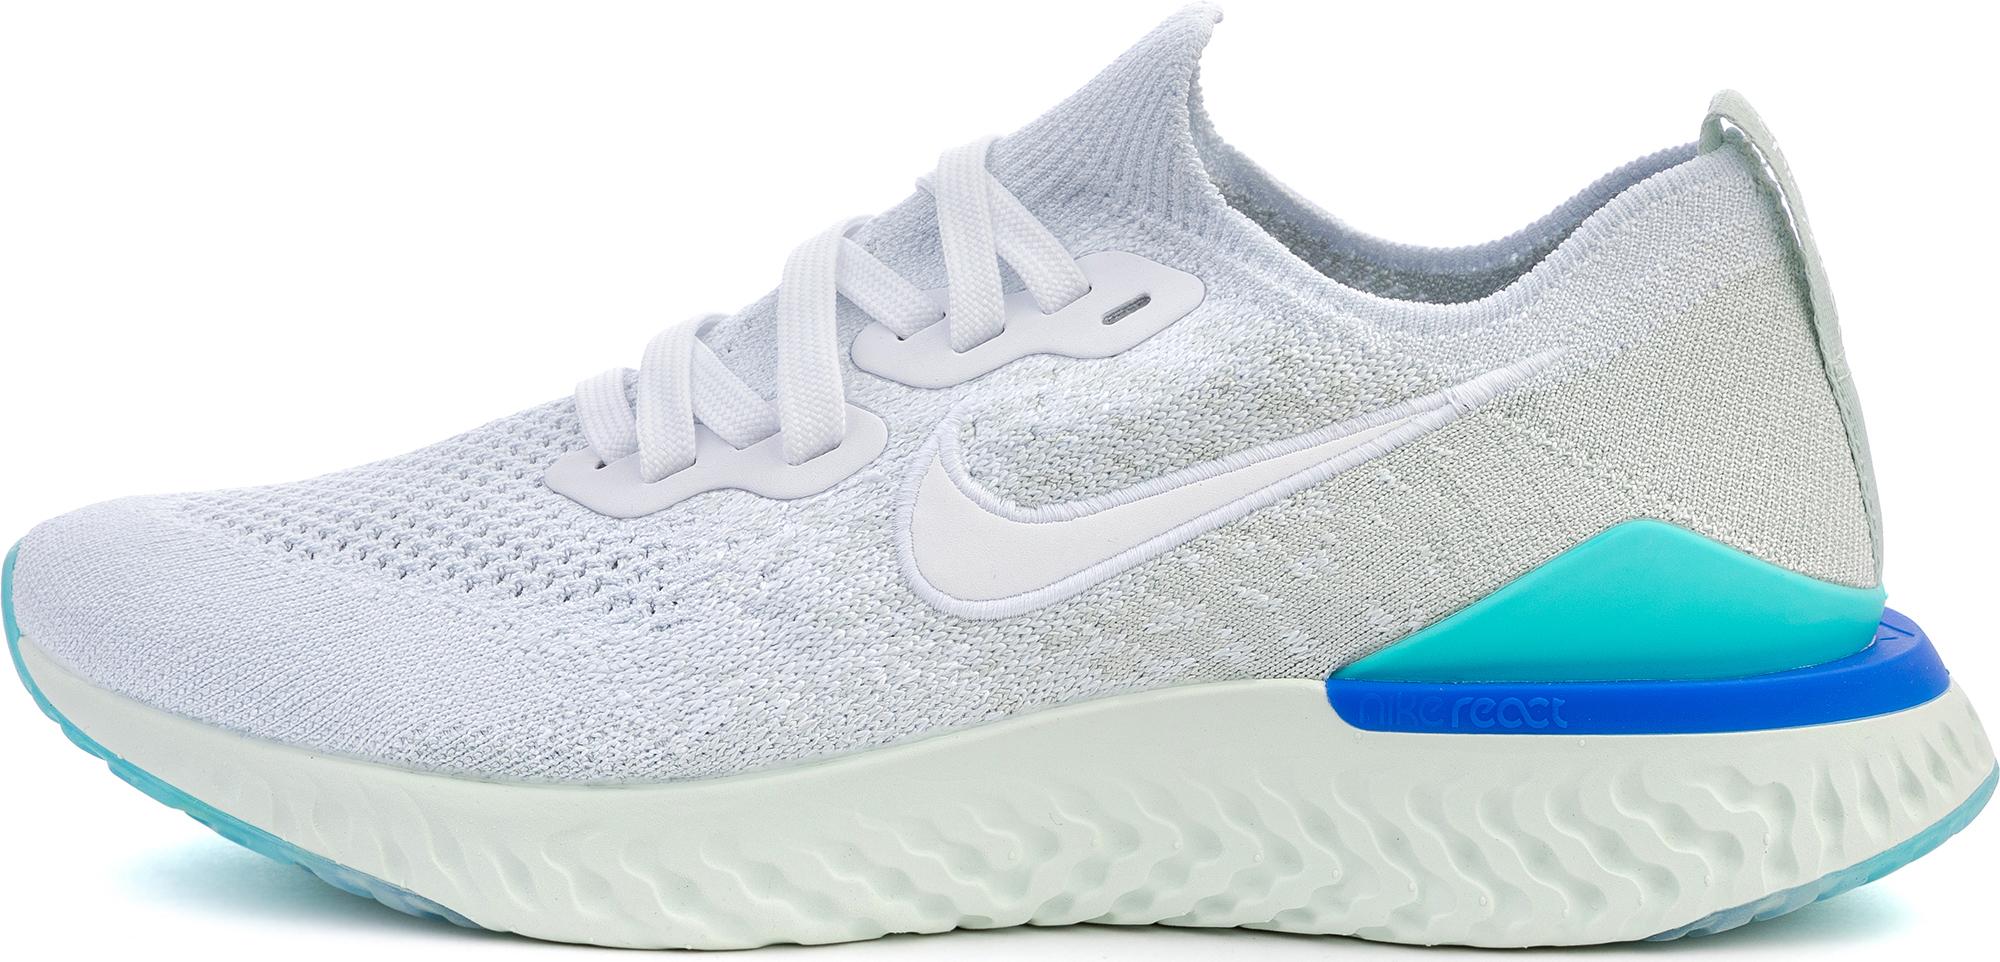 Nike Кроссовки женские Epic React Flyknit 2, размер 39